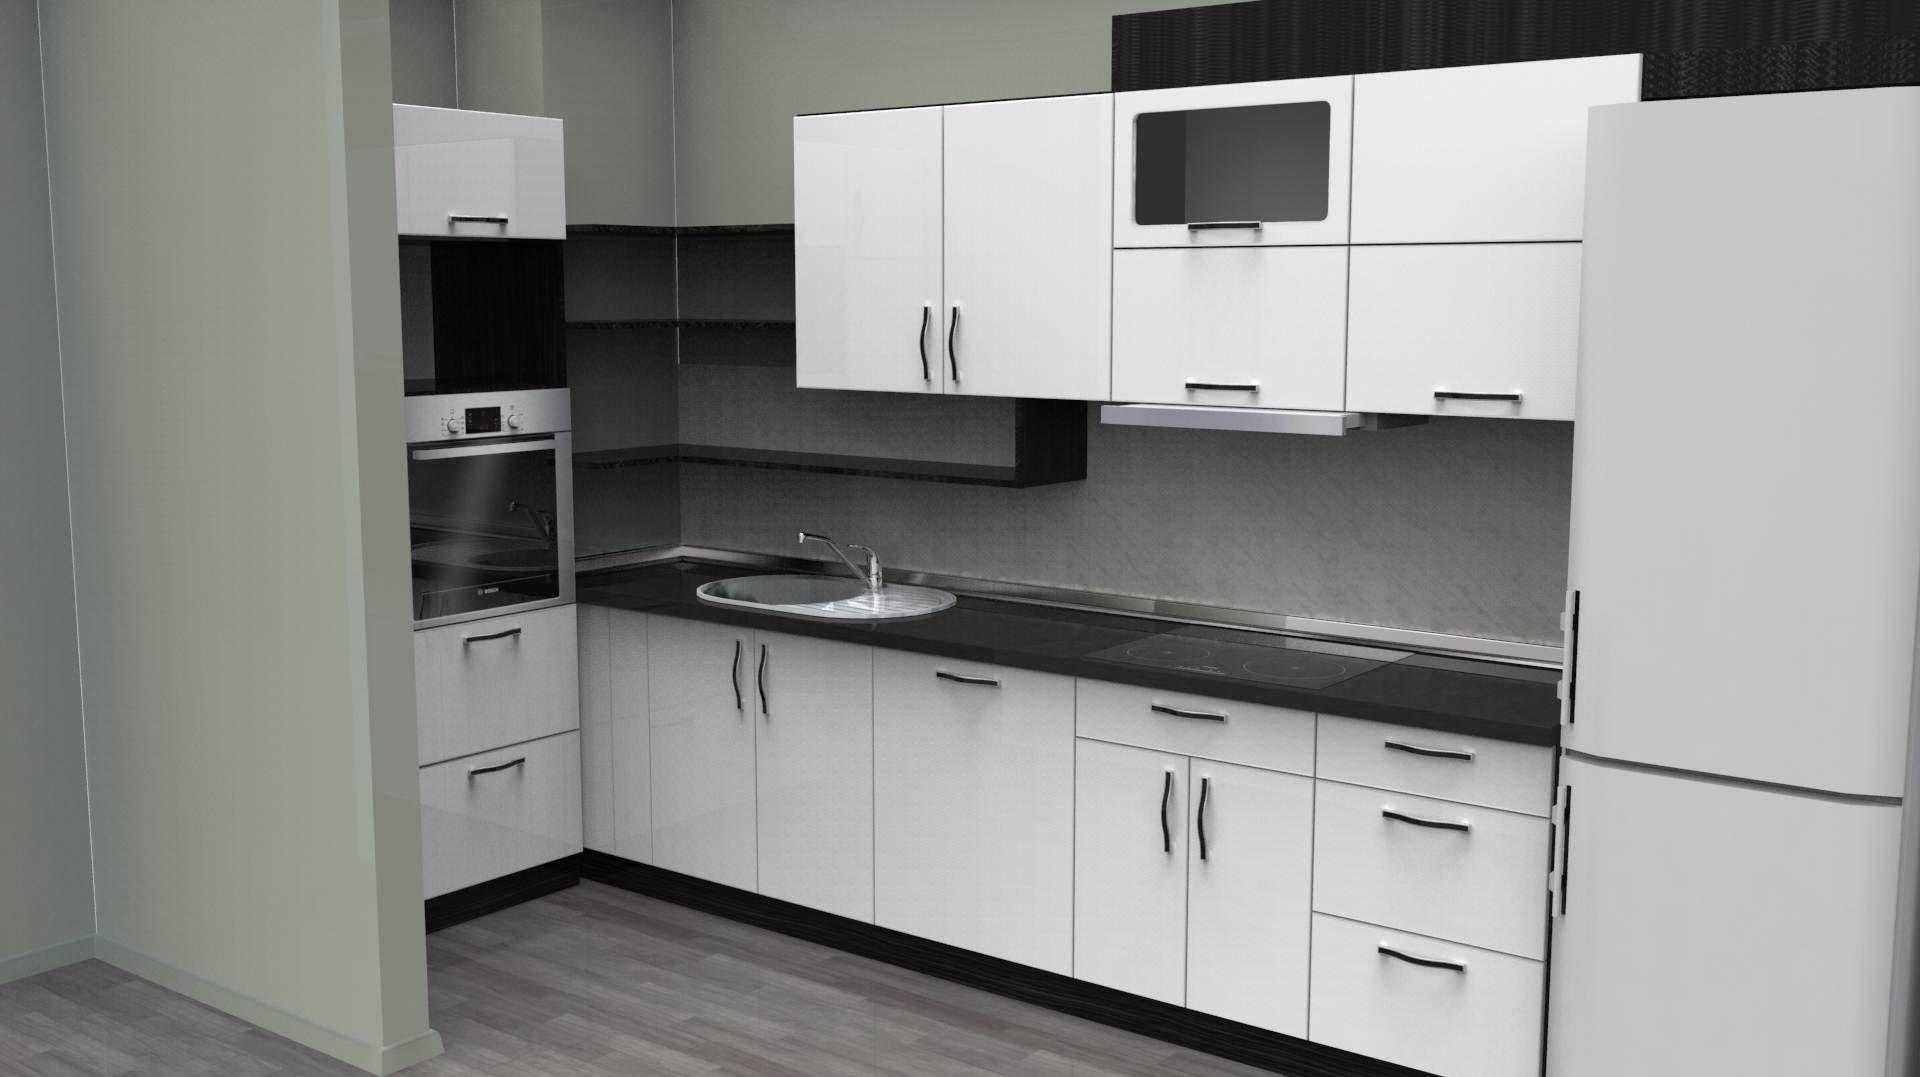 Online Kitchen Designer Tool Interior Paint Color Schemes Check More At Http Mindlessarel